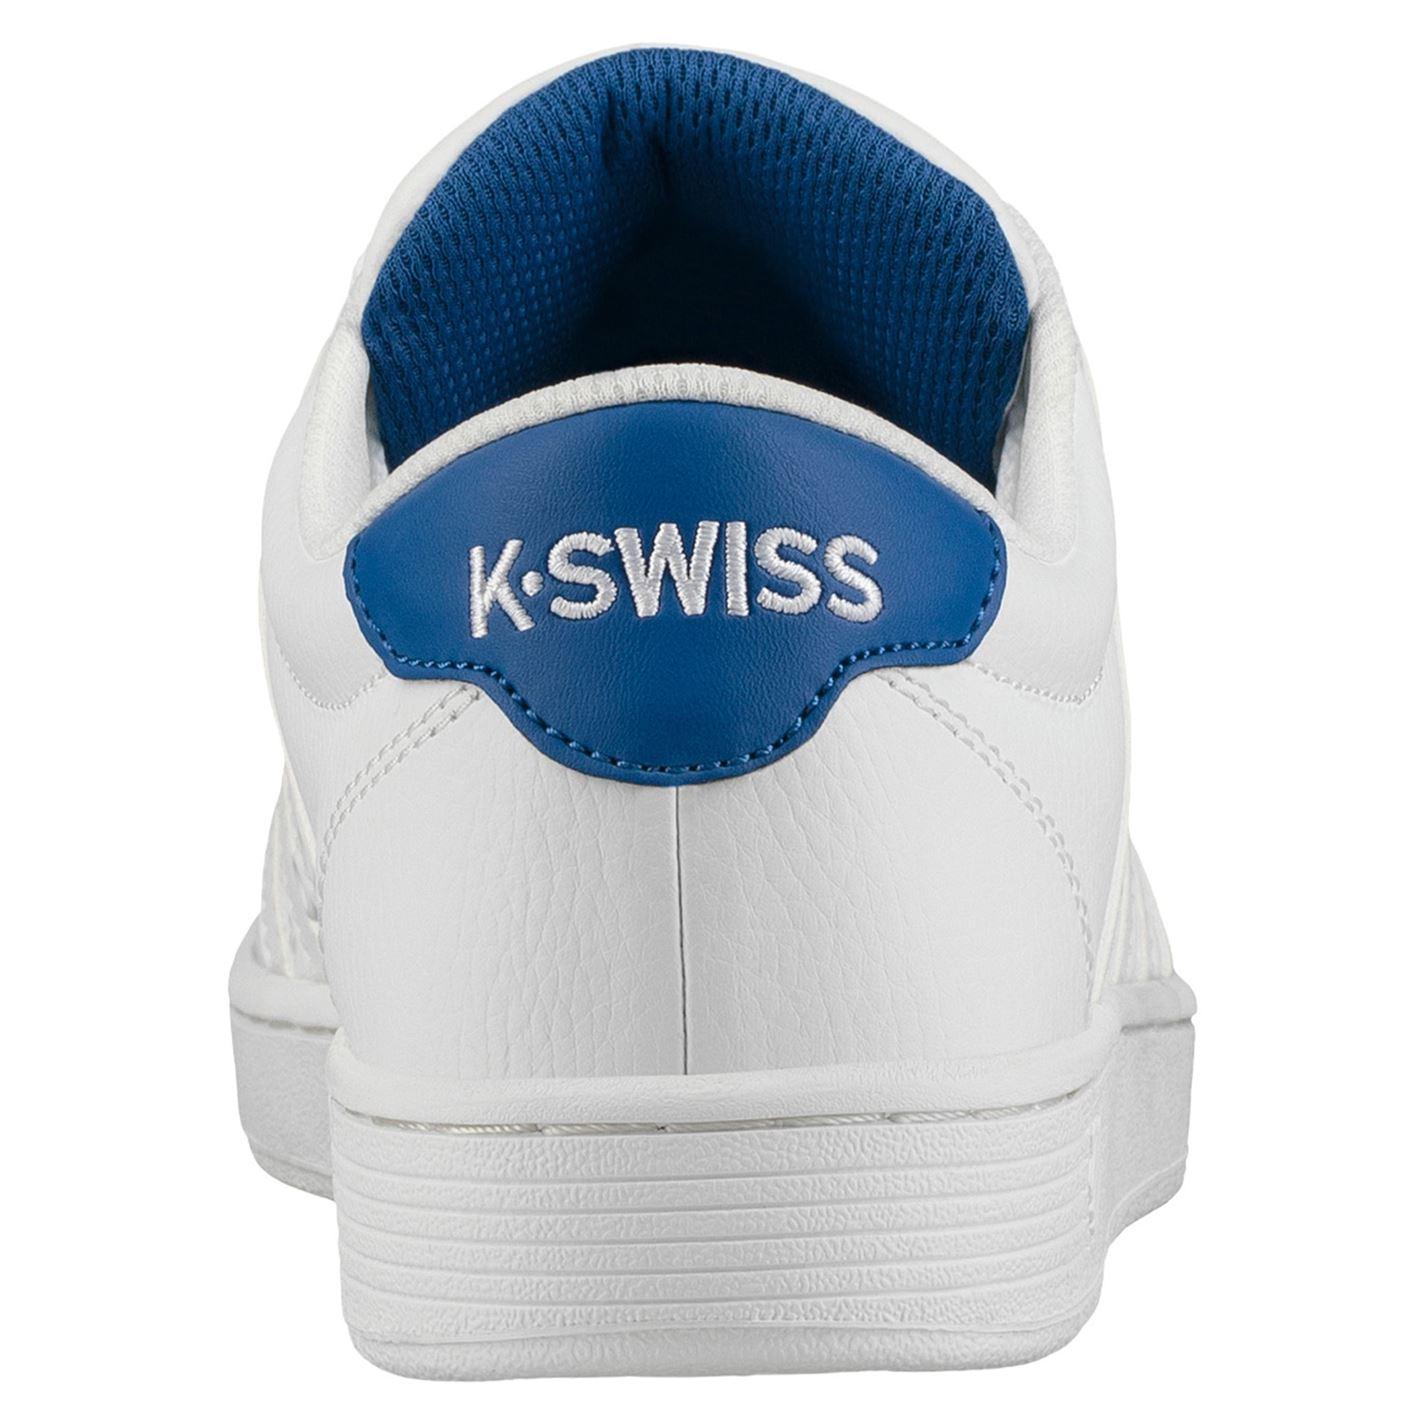 K Swiss Court Pro II Mens Trainers